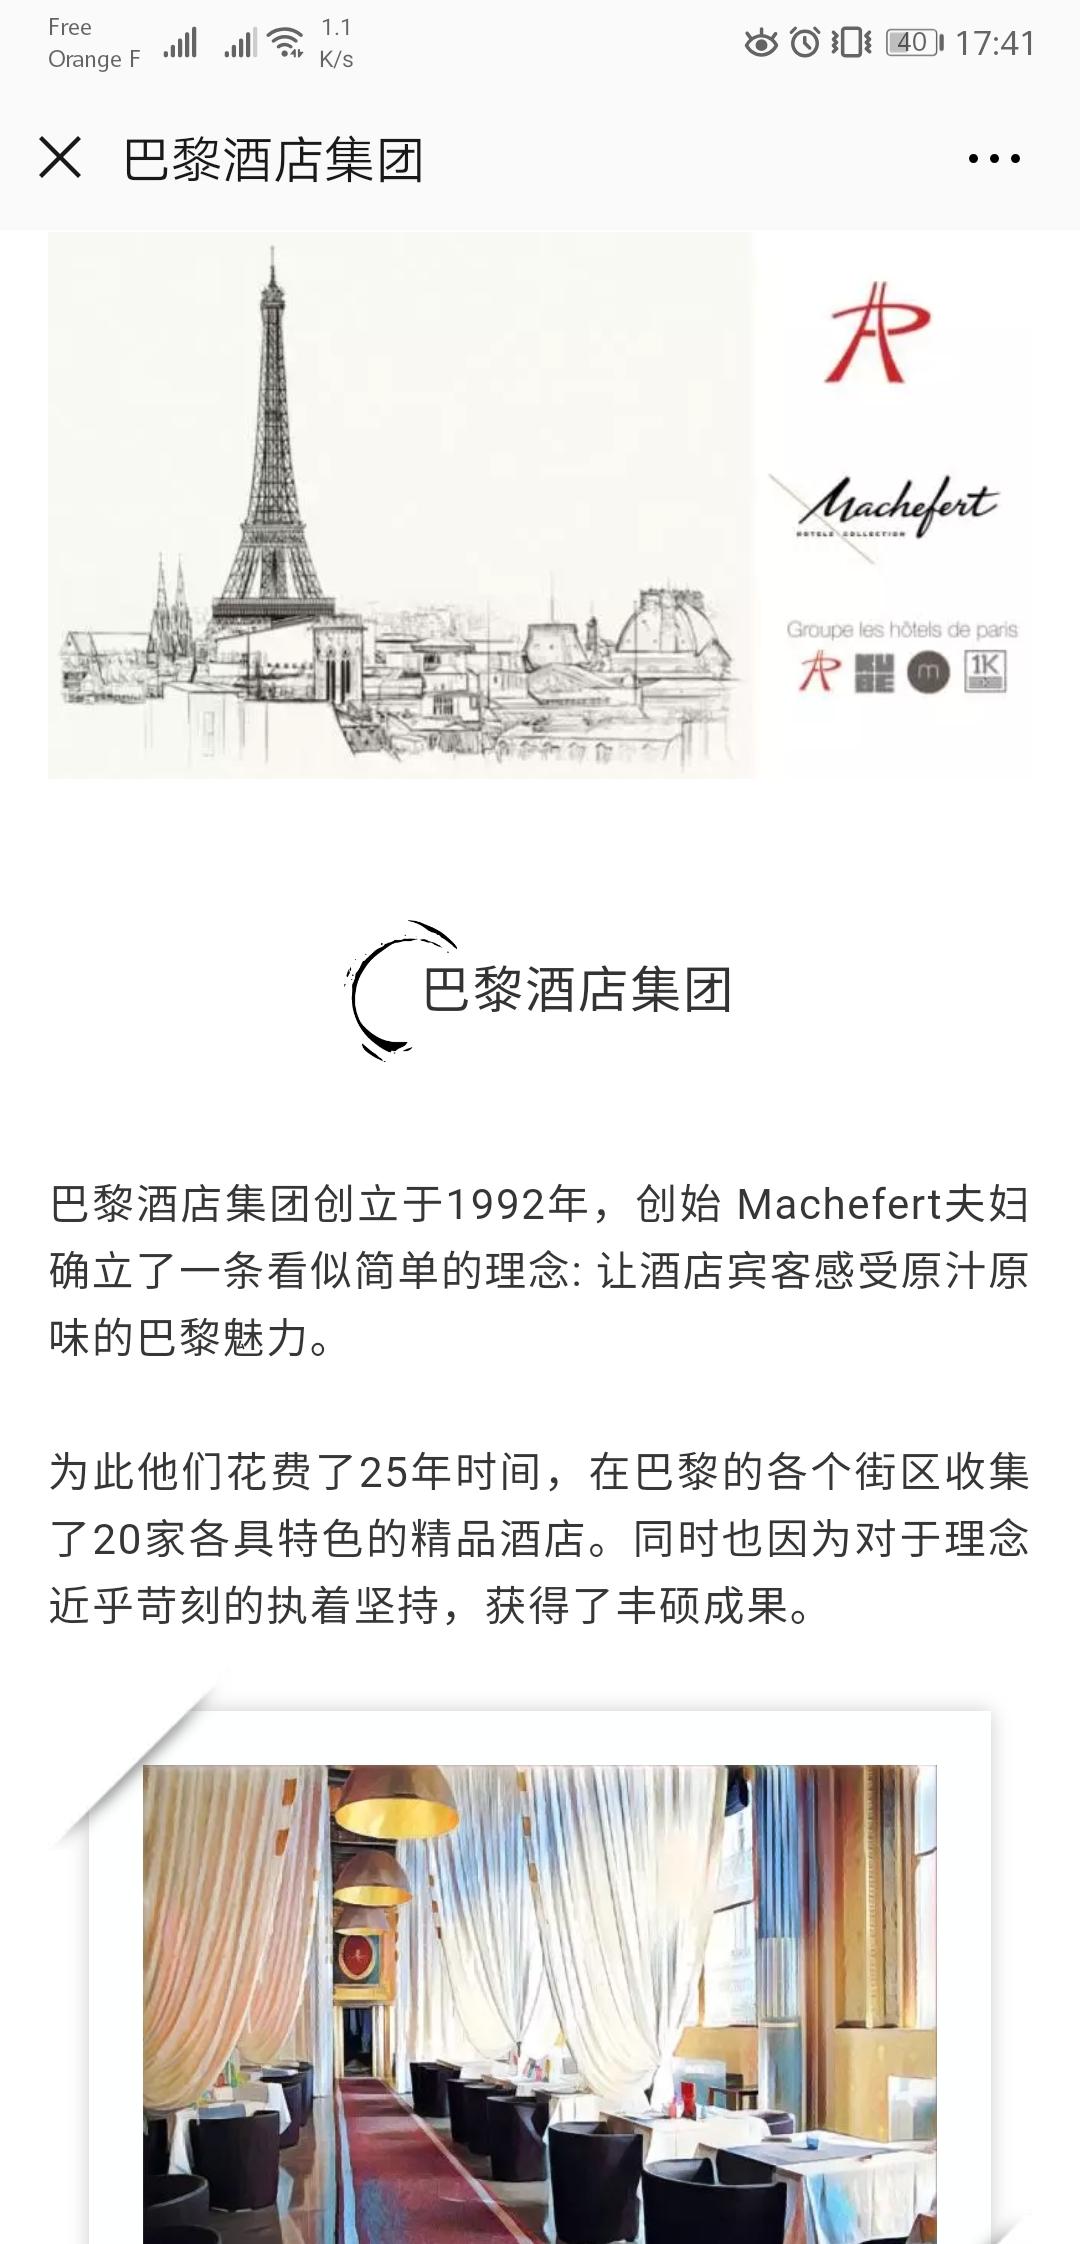 PARIS INN GROUP WeChat account